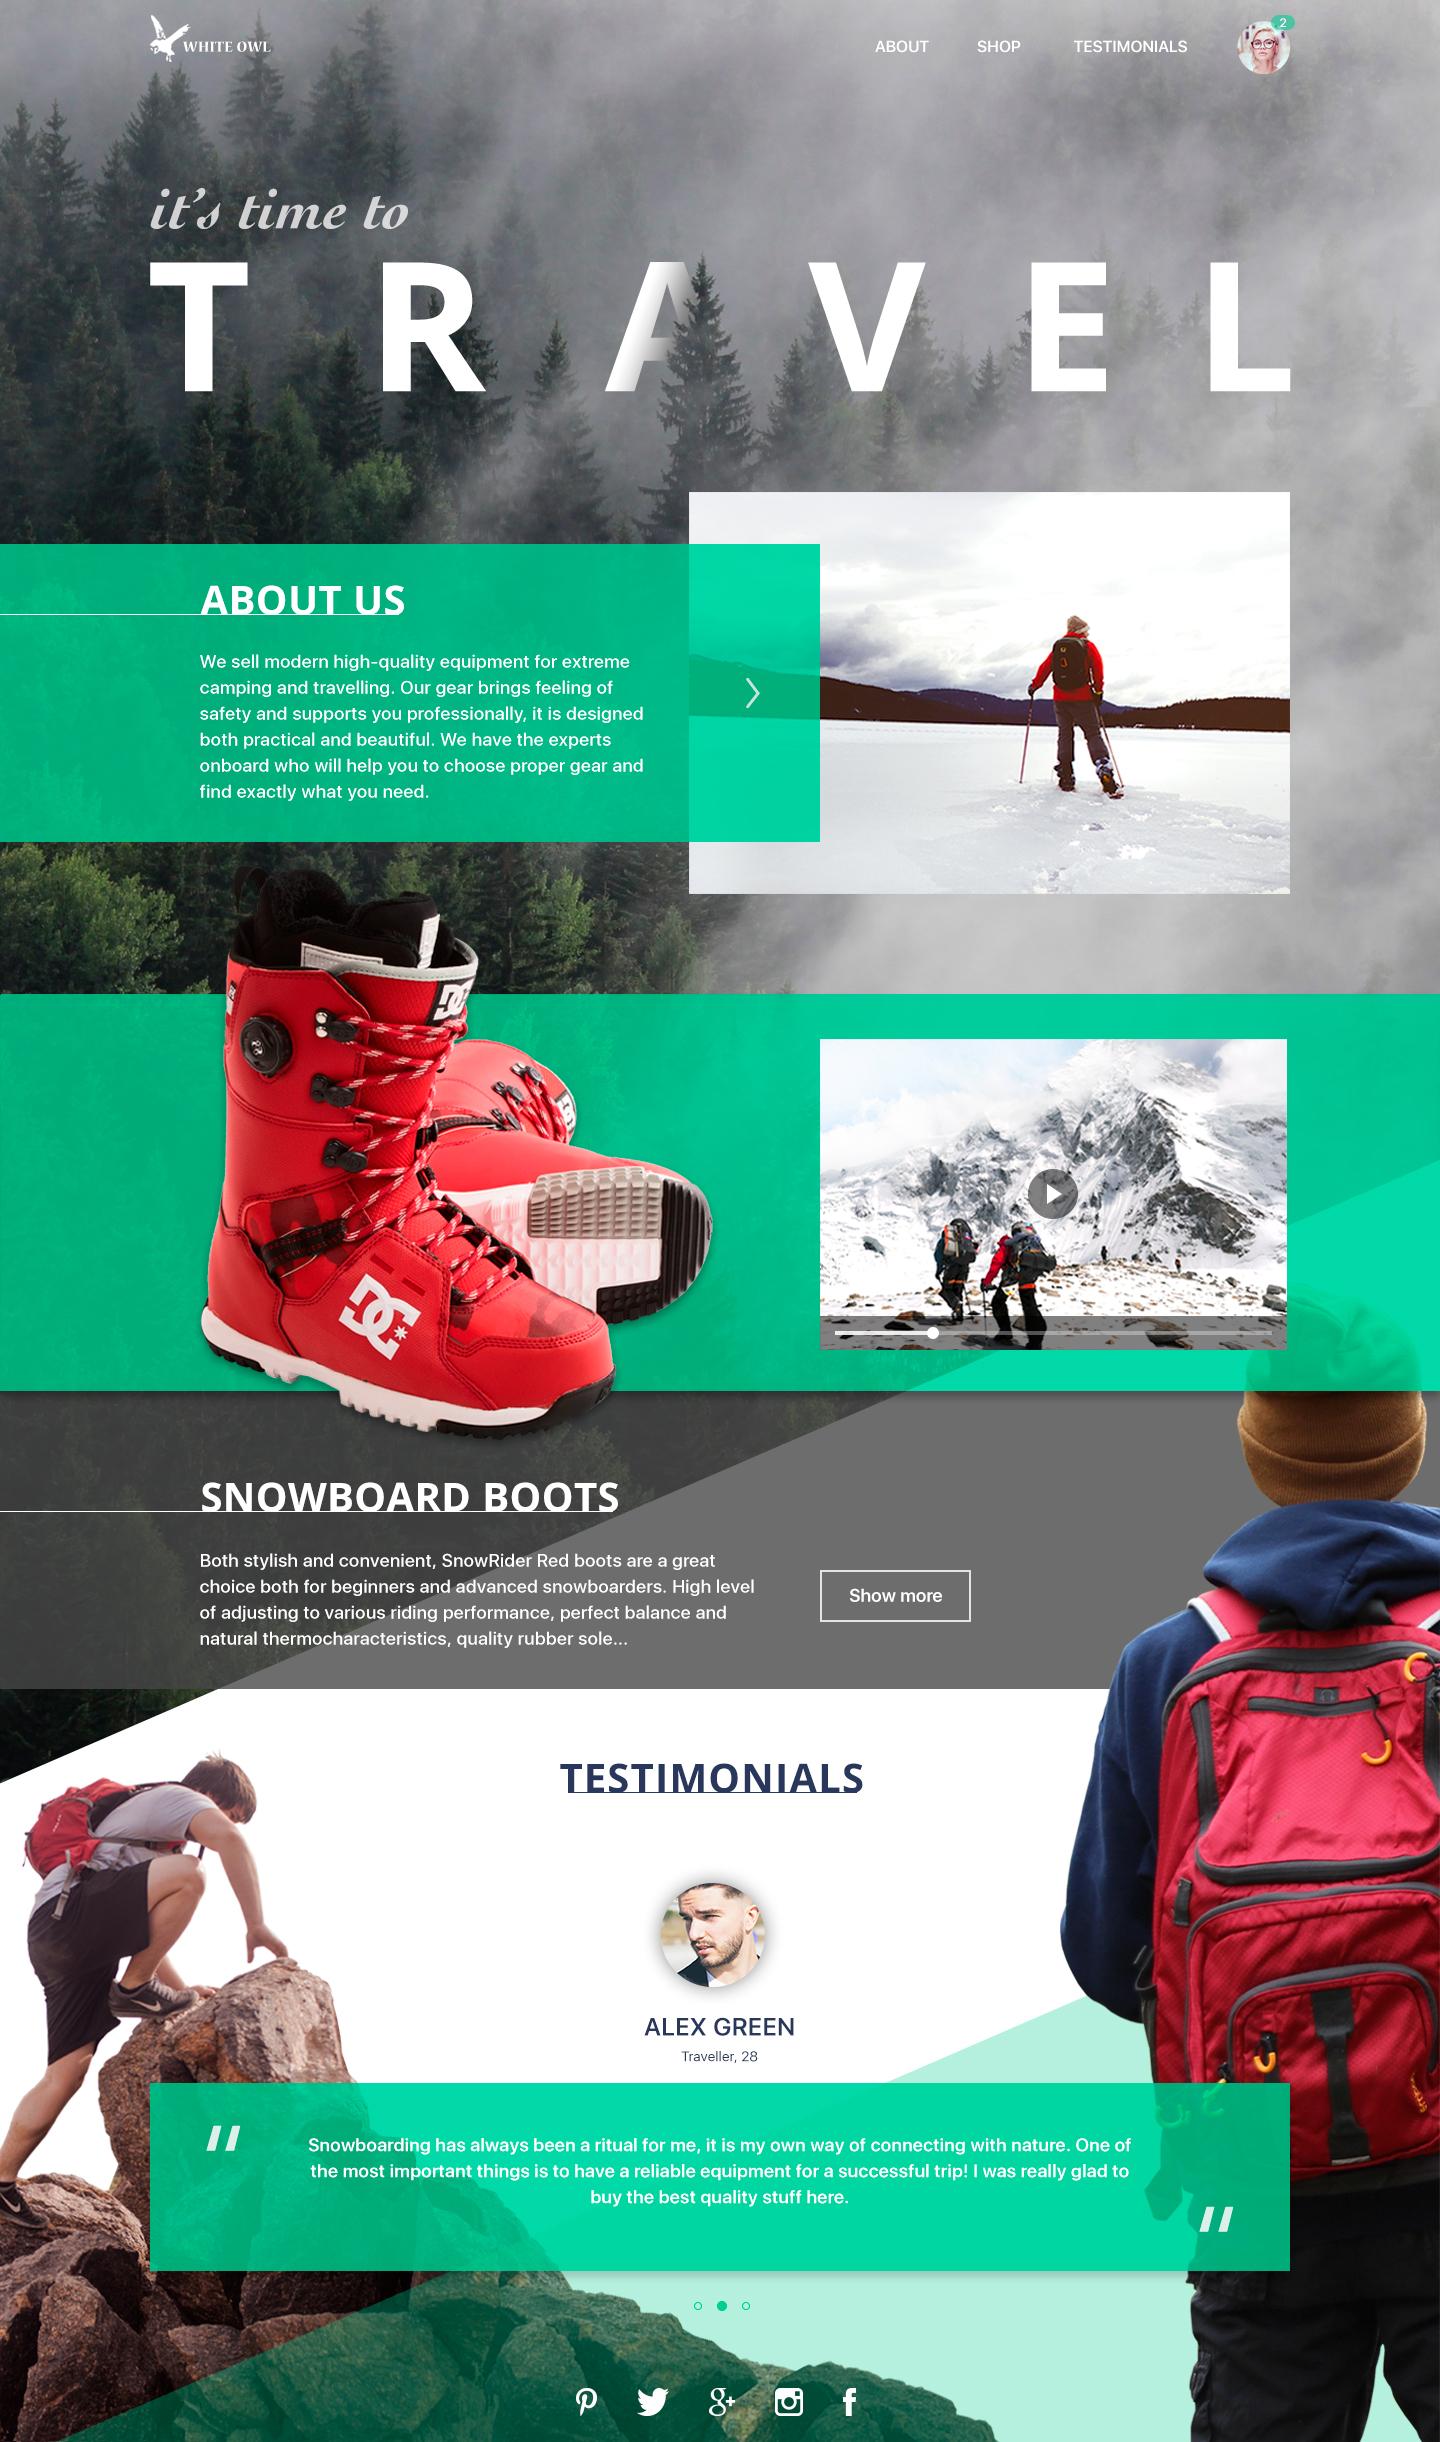 Tubikstudio travel gear landing page